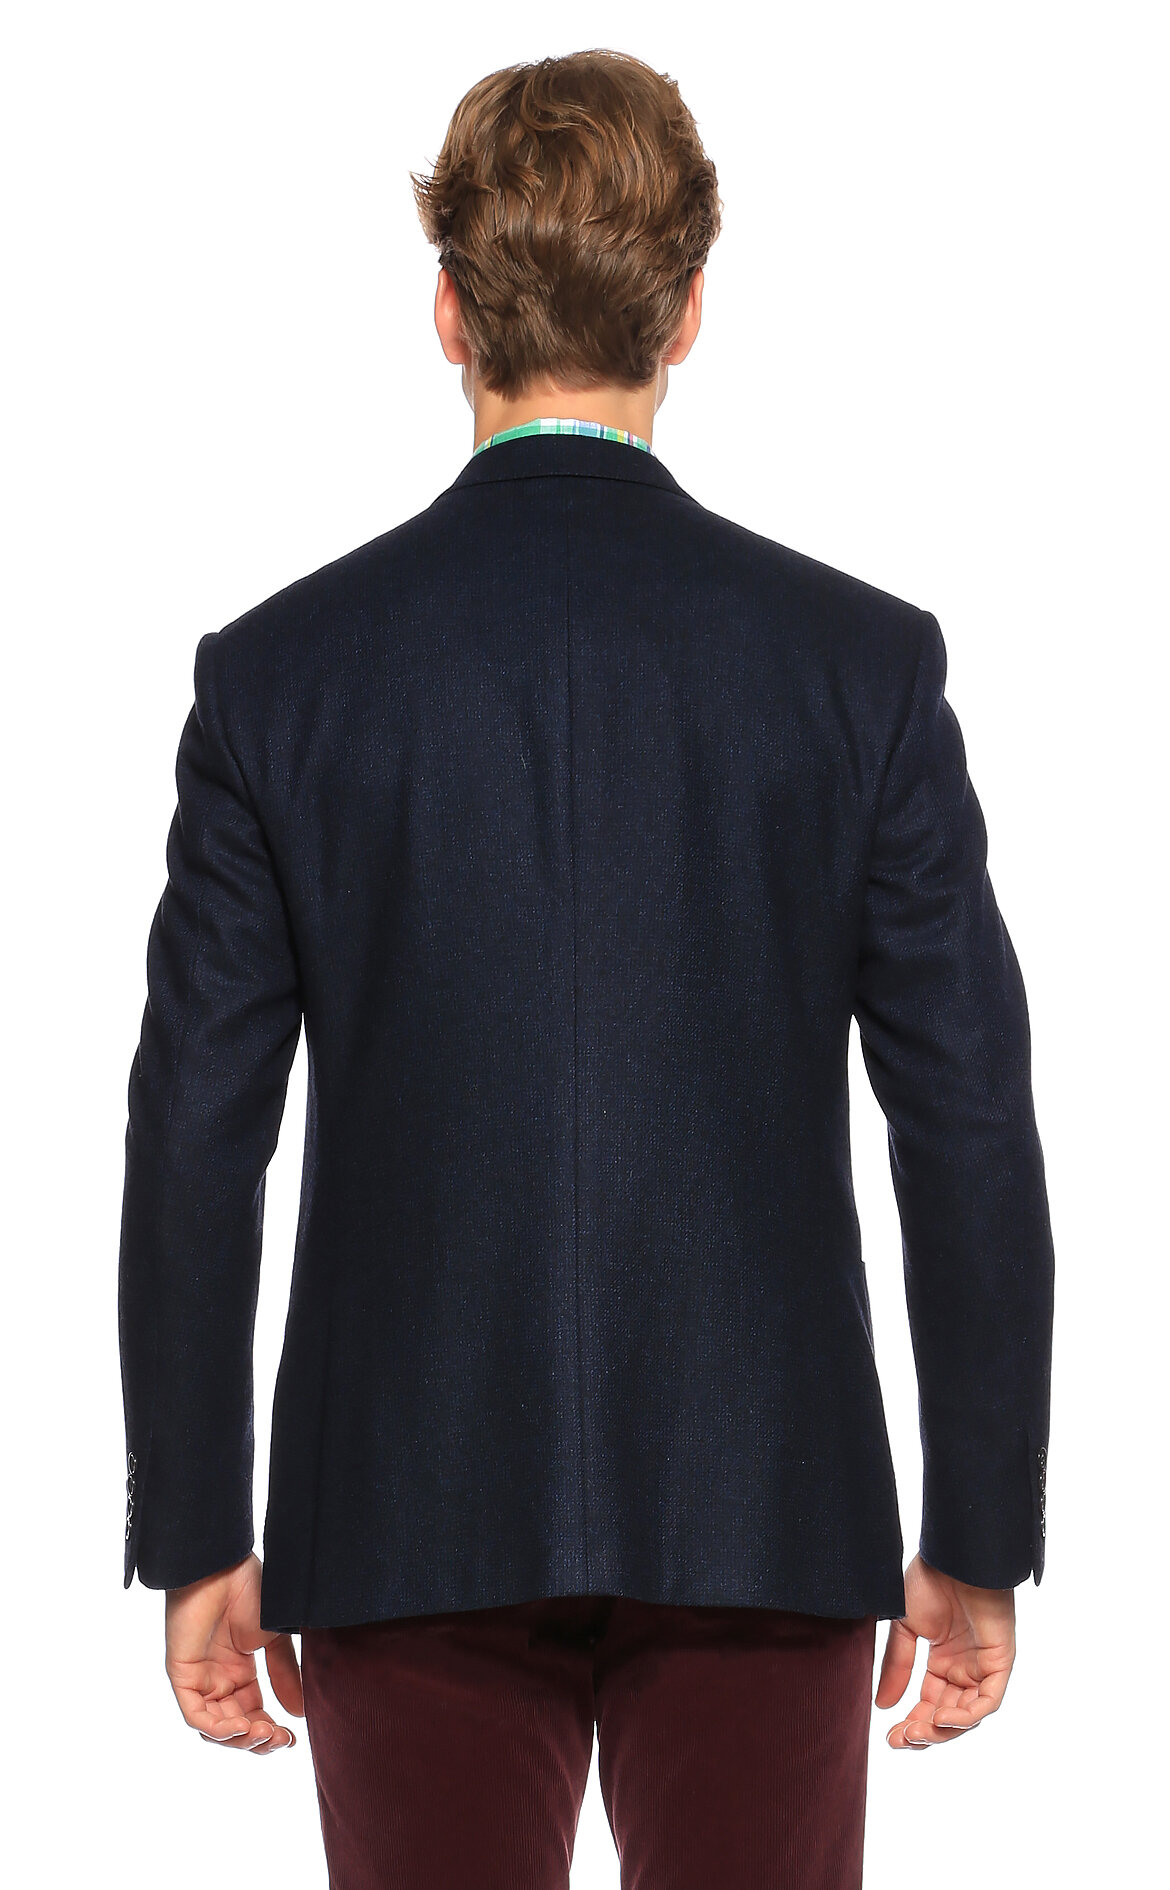 Ralph Lauren Blue Label Lacivert Ceket